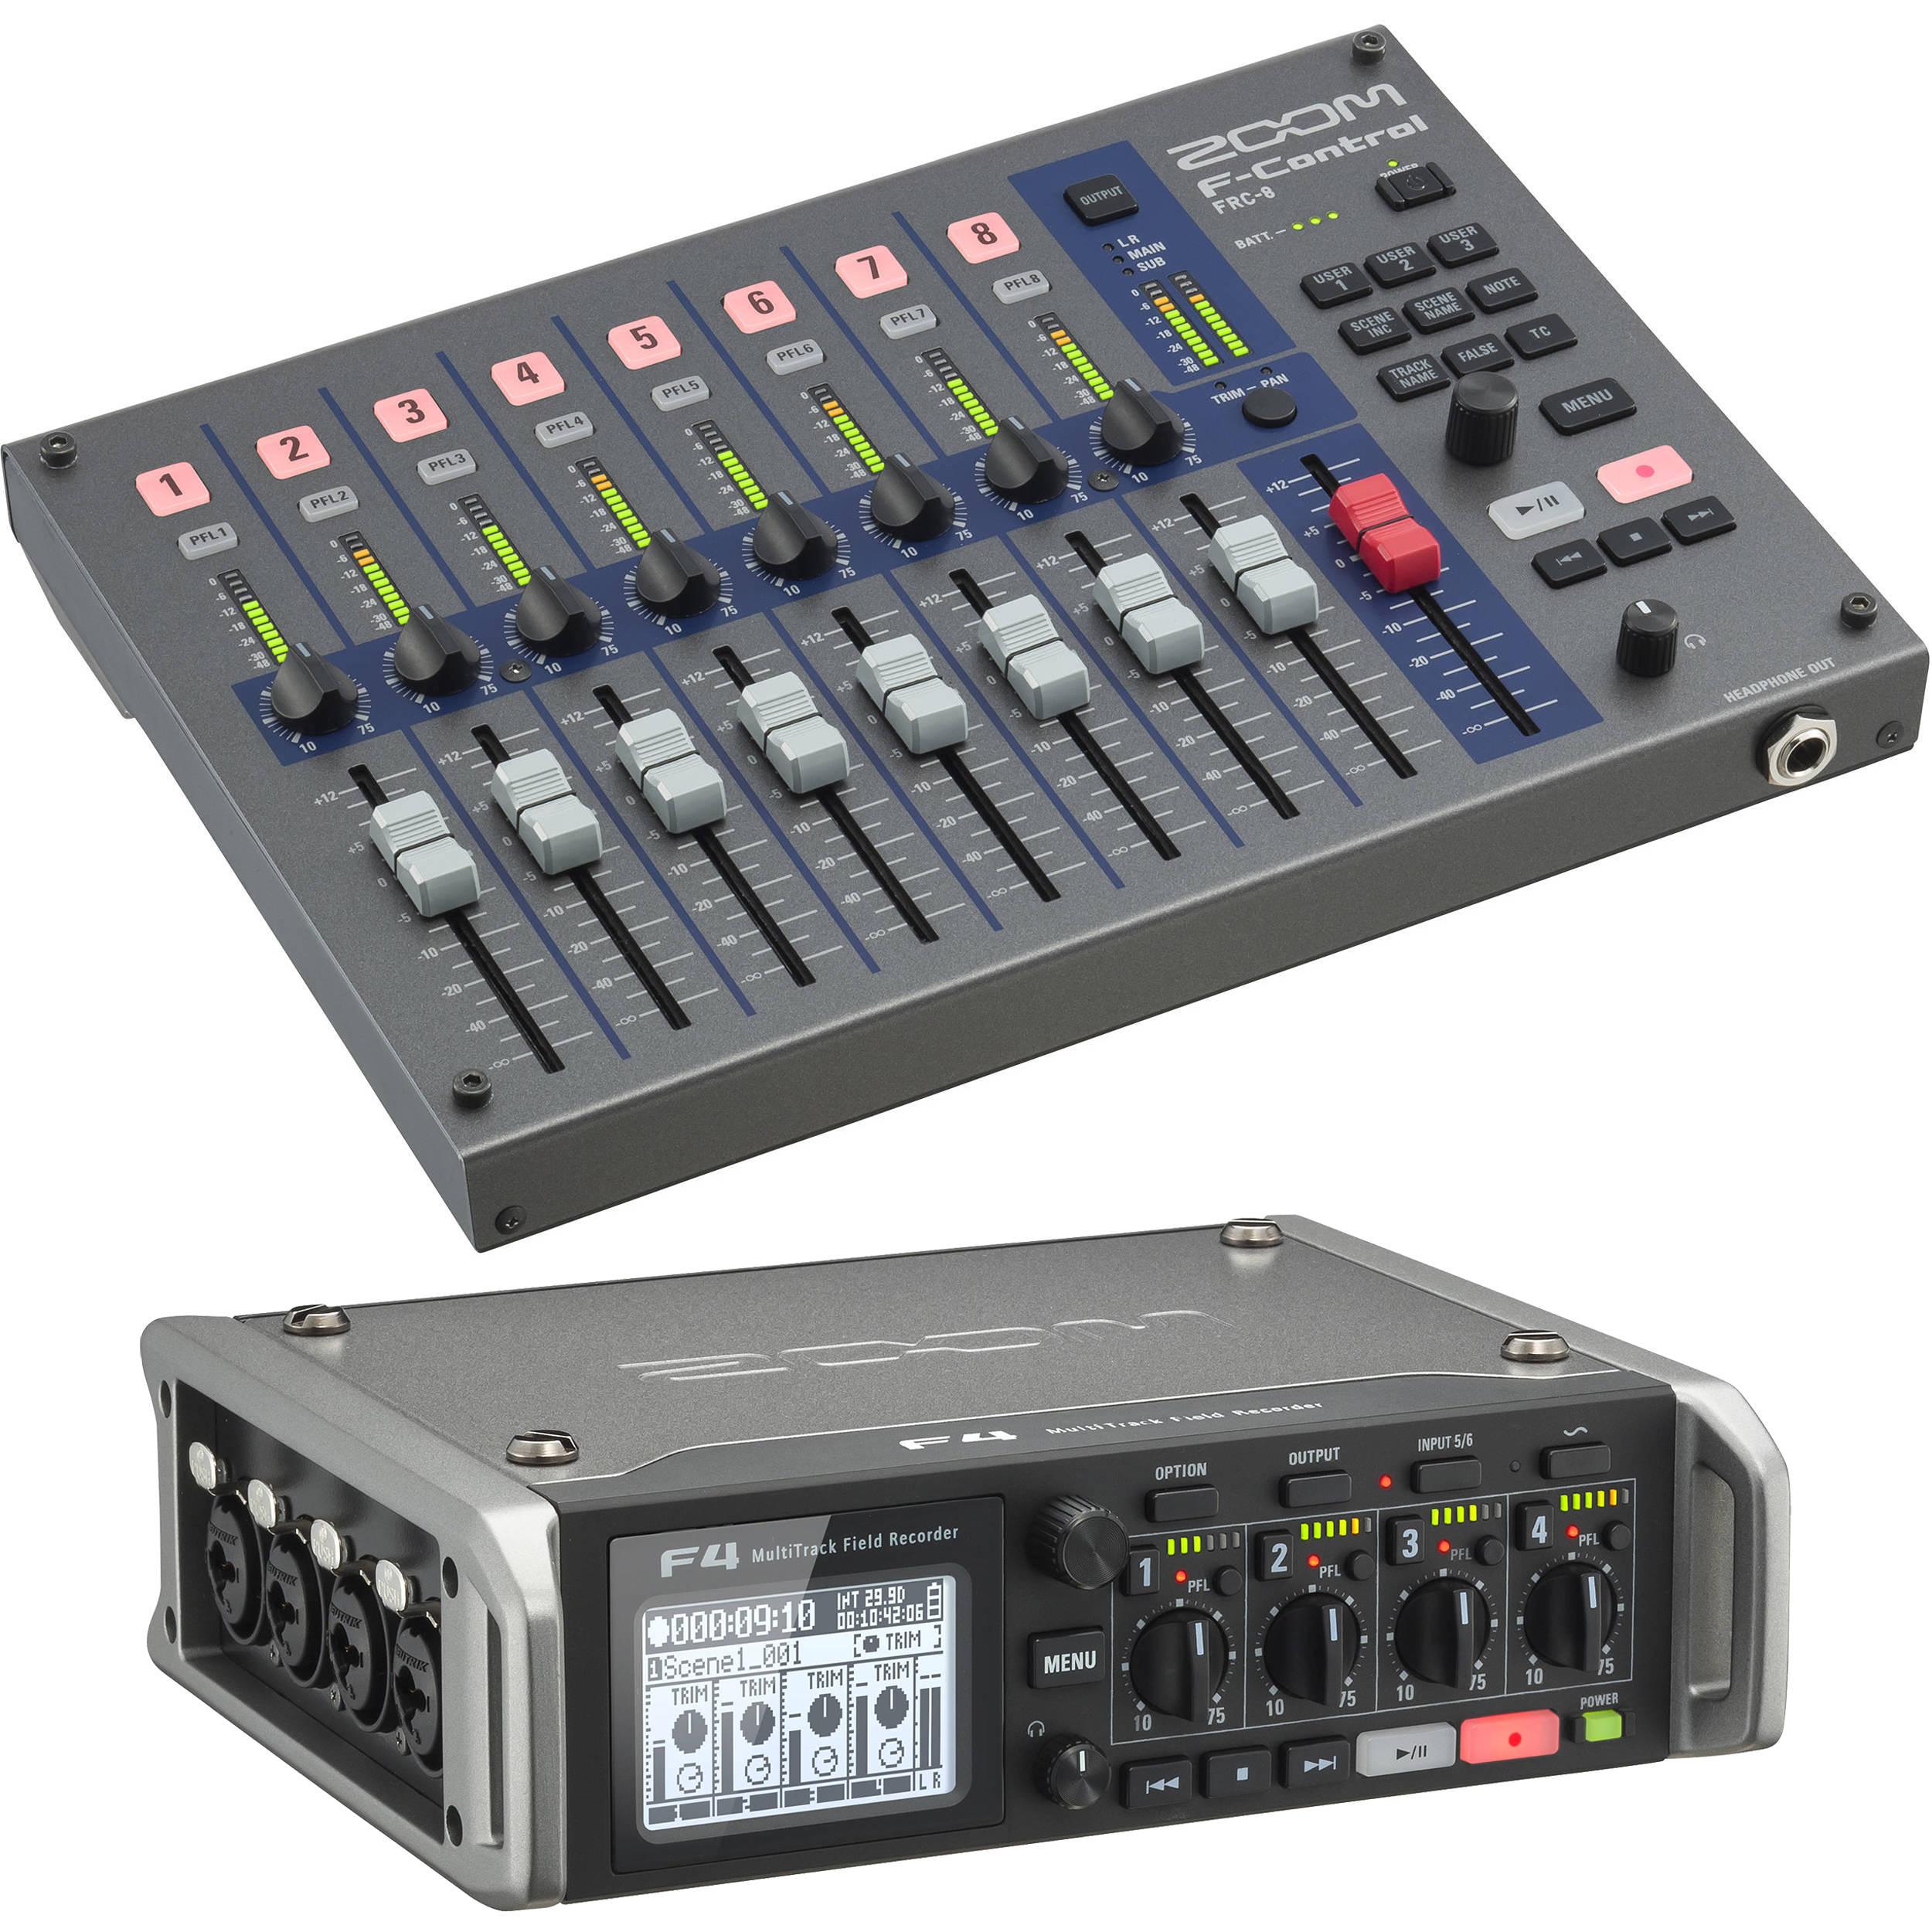 Digital Mixer With Multitrack Recording : zoom zoom f4 multitrack field recorder kit with f control mixer ~ Vivirlamusica.com Haus und Dekorationen